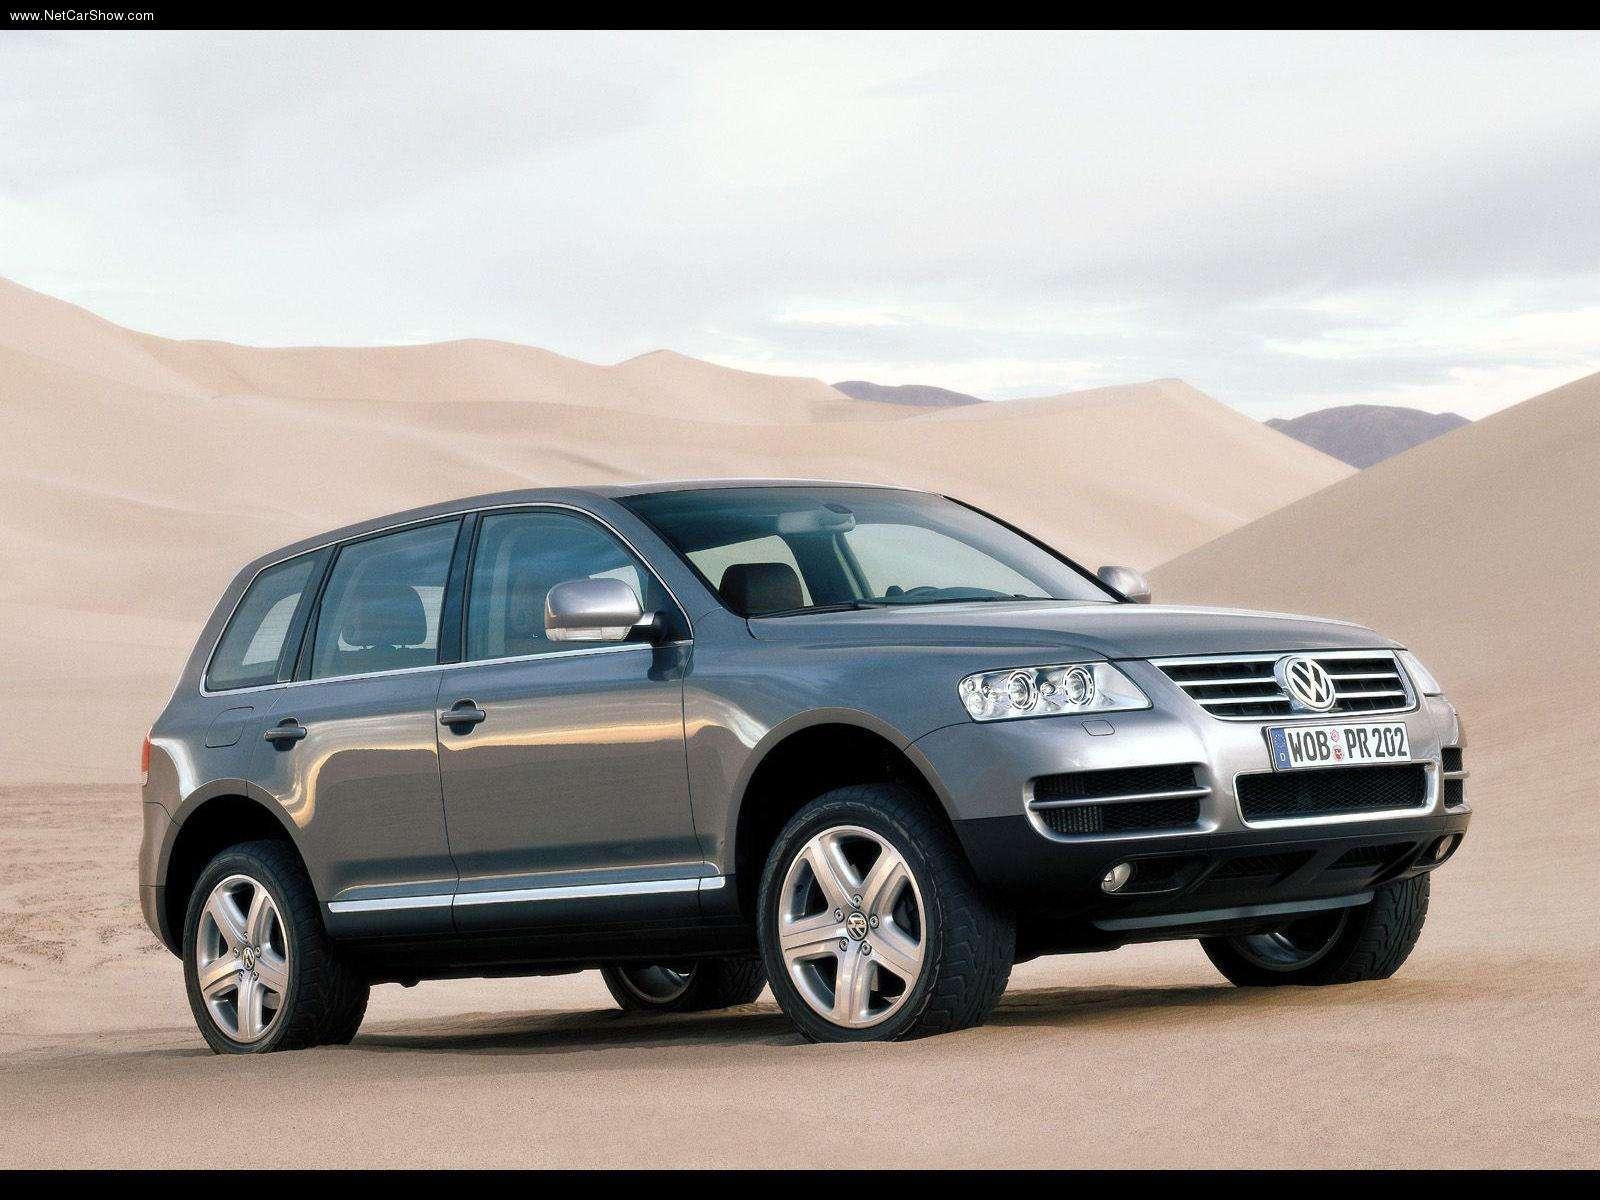 File Volkswagen Touareg HQFXjpg David Kogan 1600x1200px 1600x1200